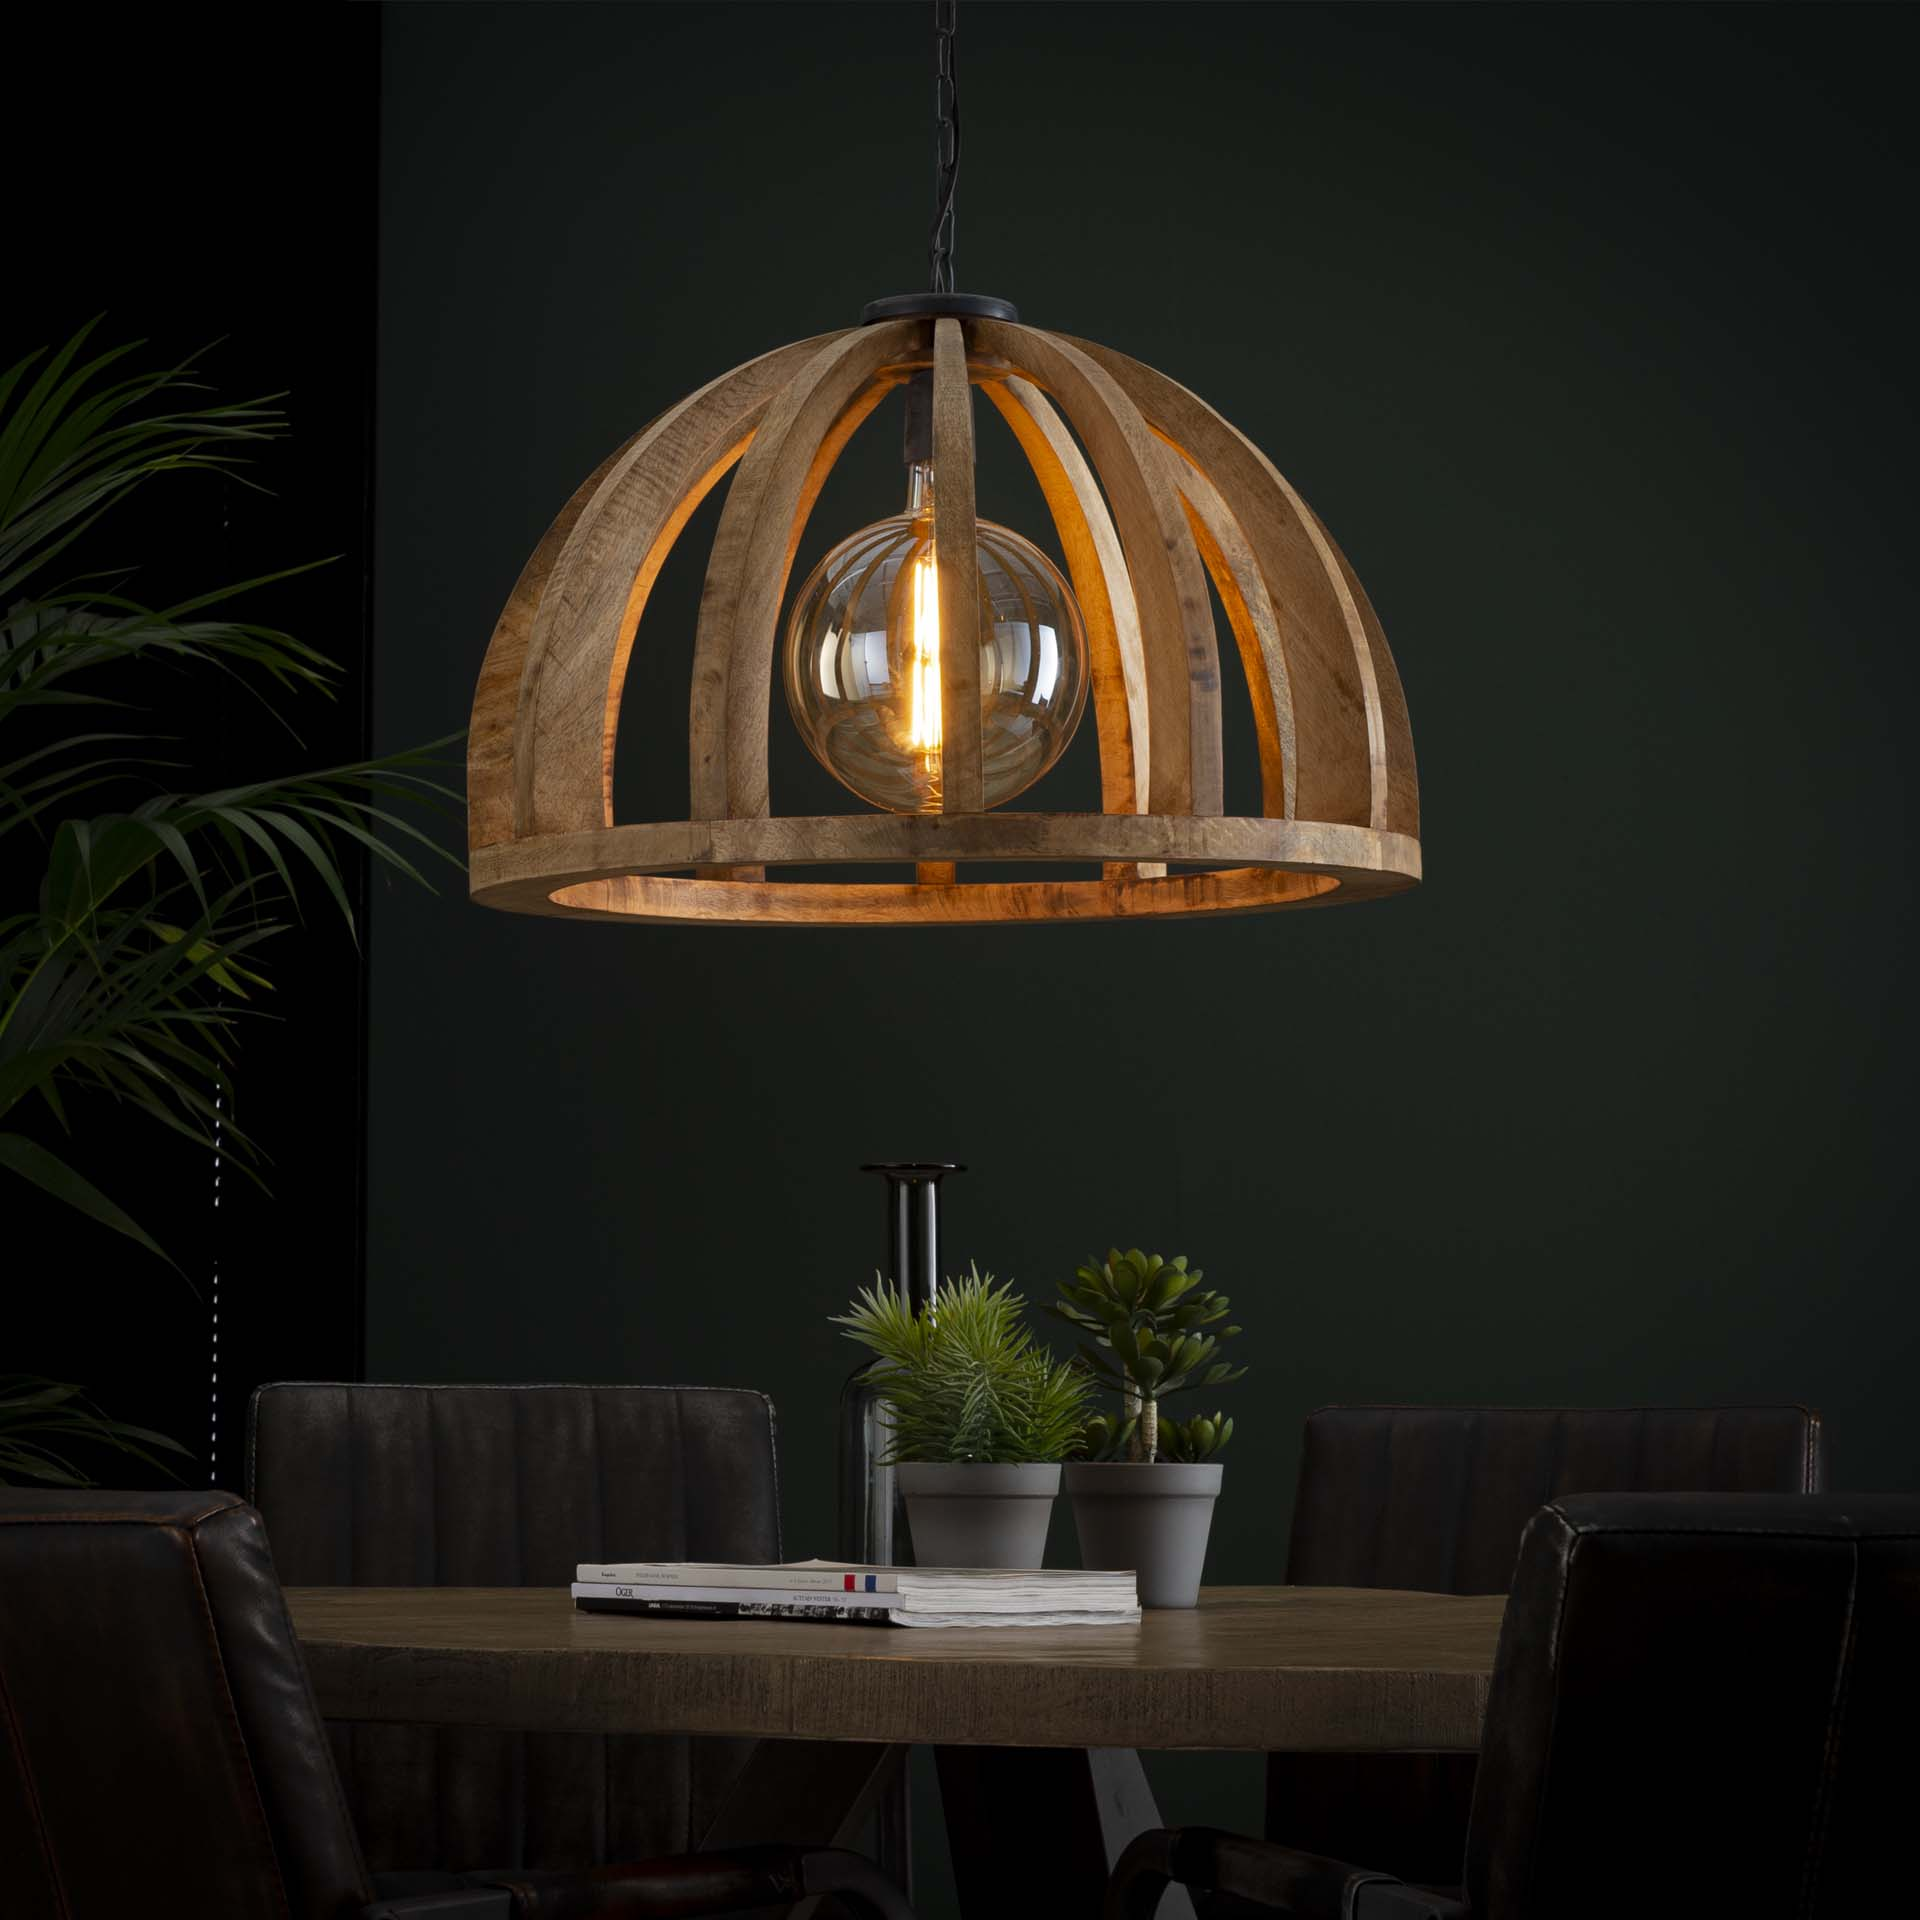 Hanglamp 60 gebogen houten spijlen - Massief mango naturel - Massief mango naturel